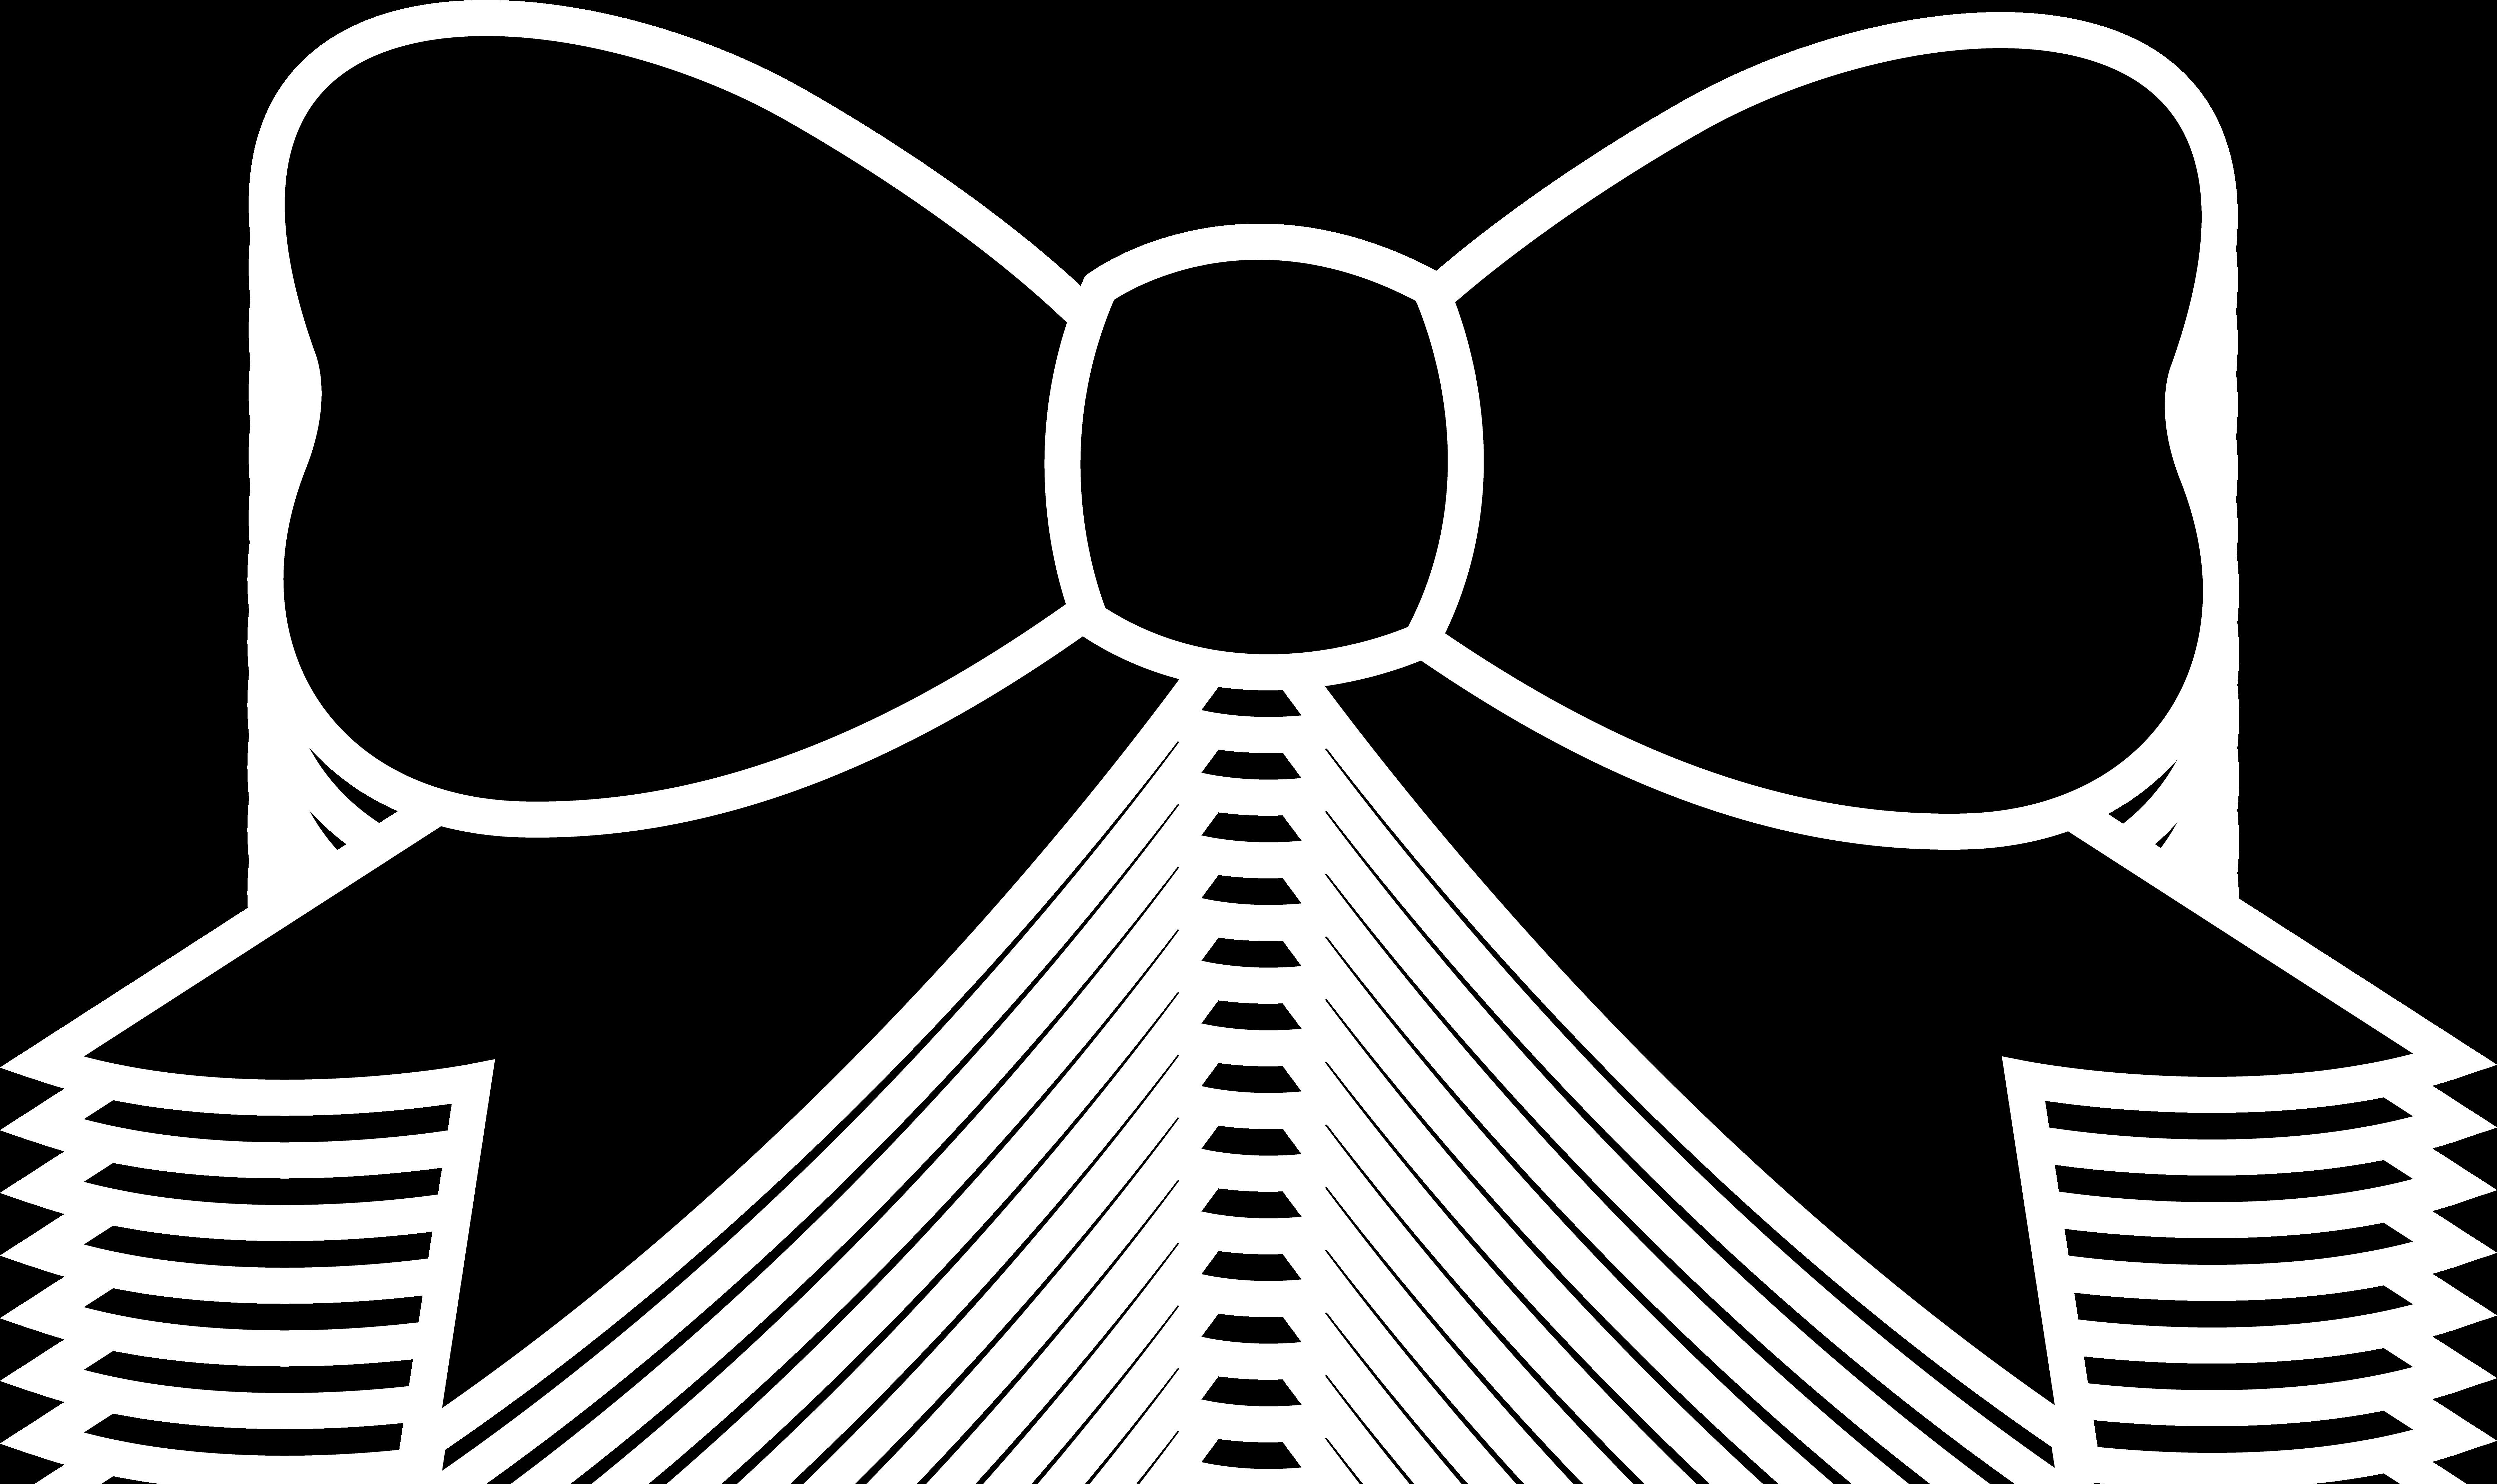 7212x4286 Bow Silhouette Clip Art